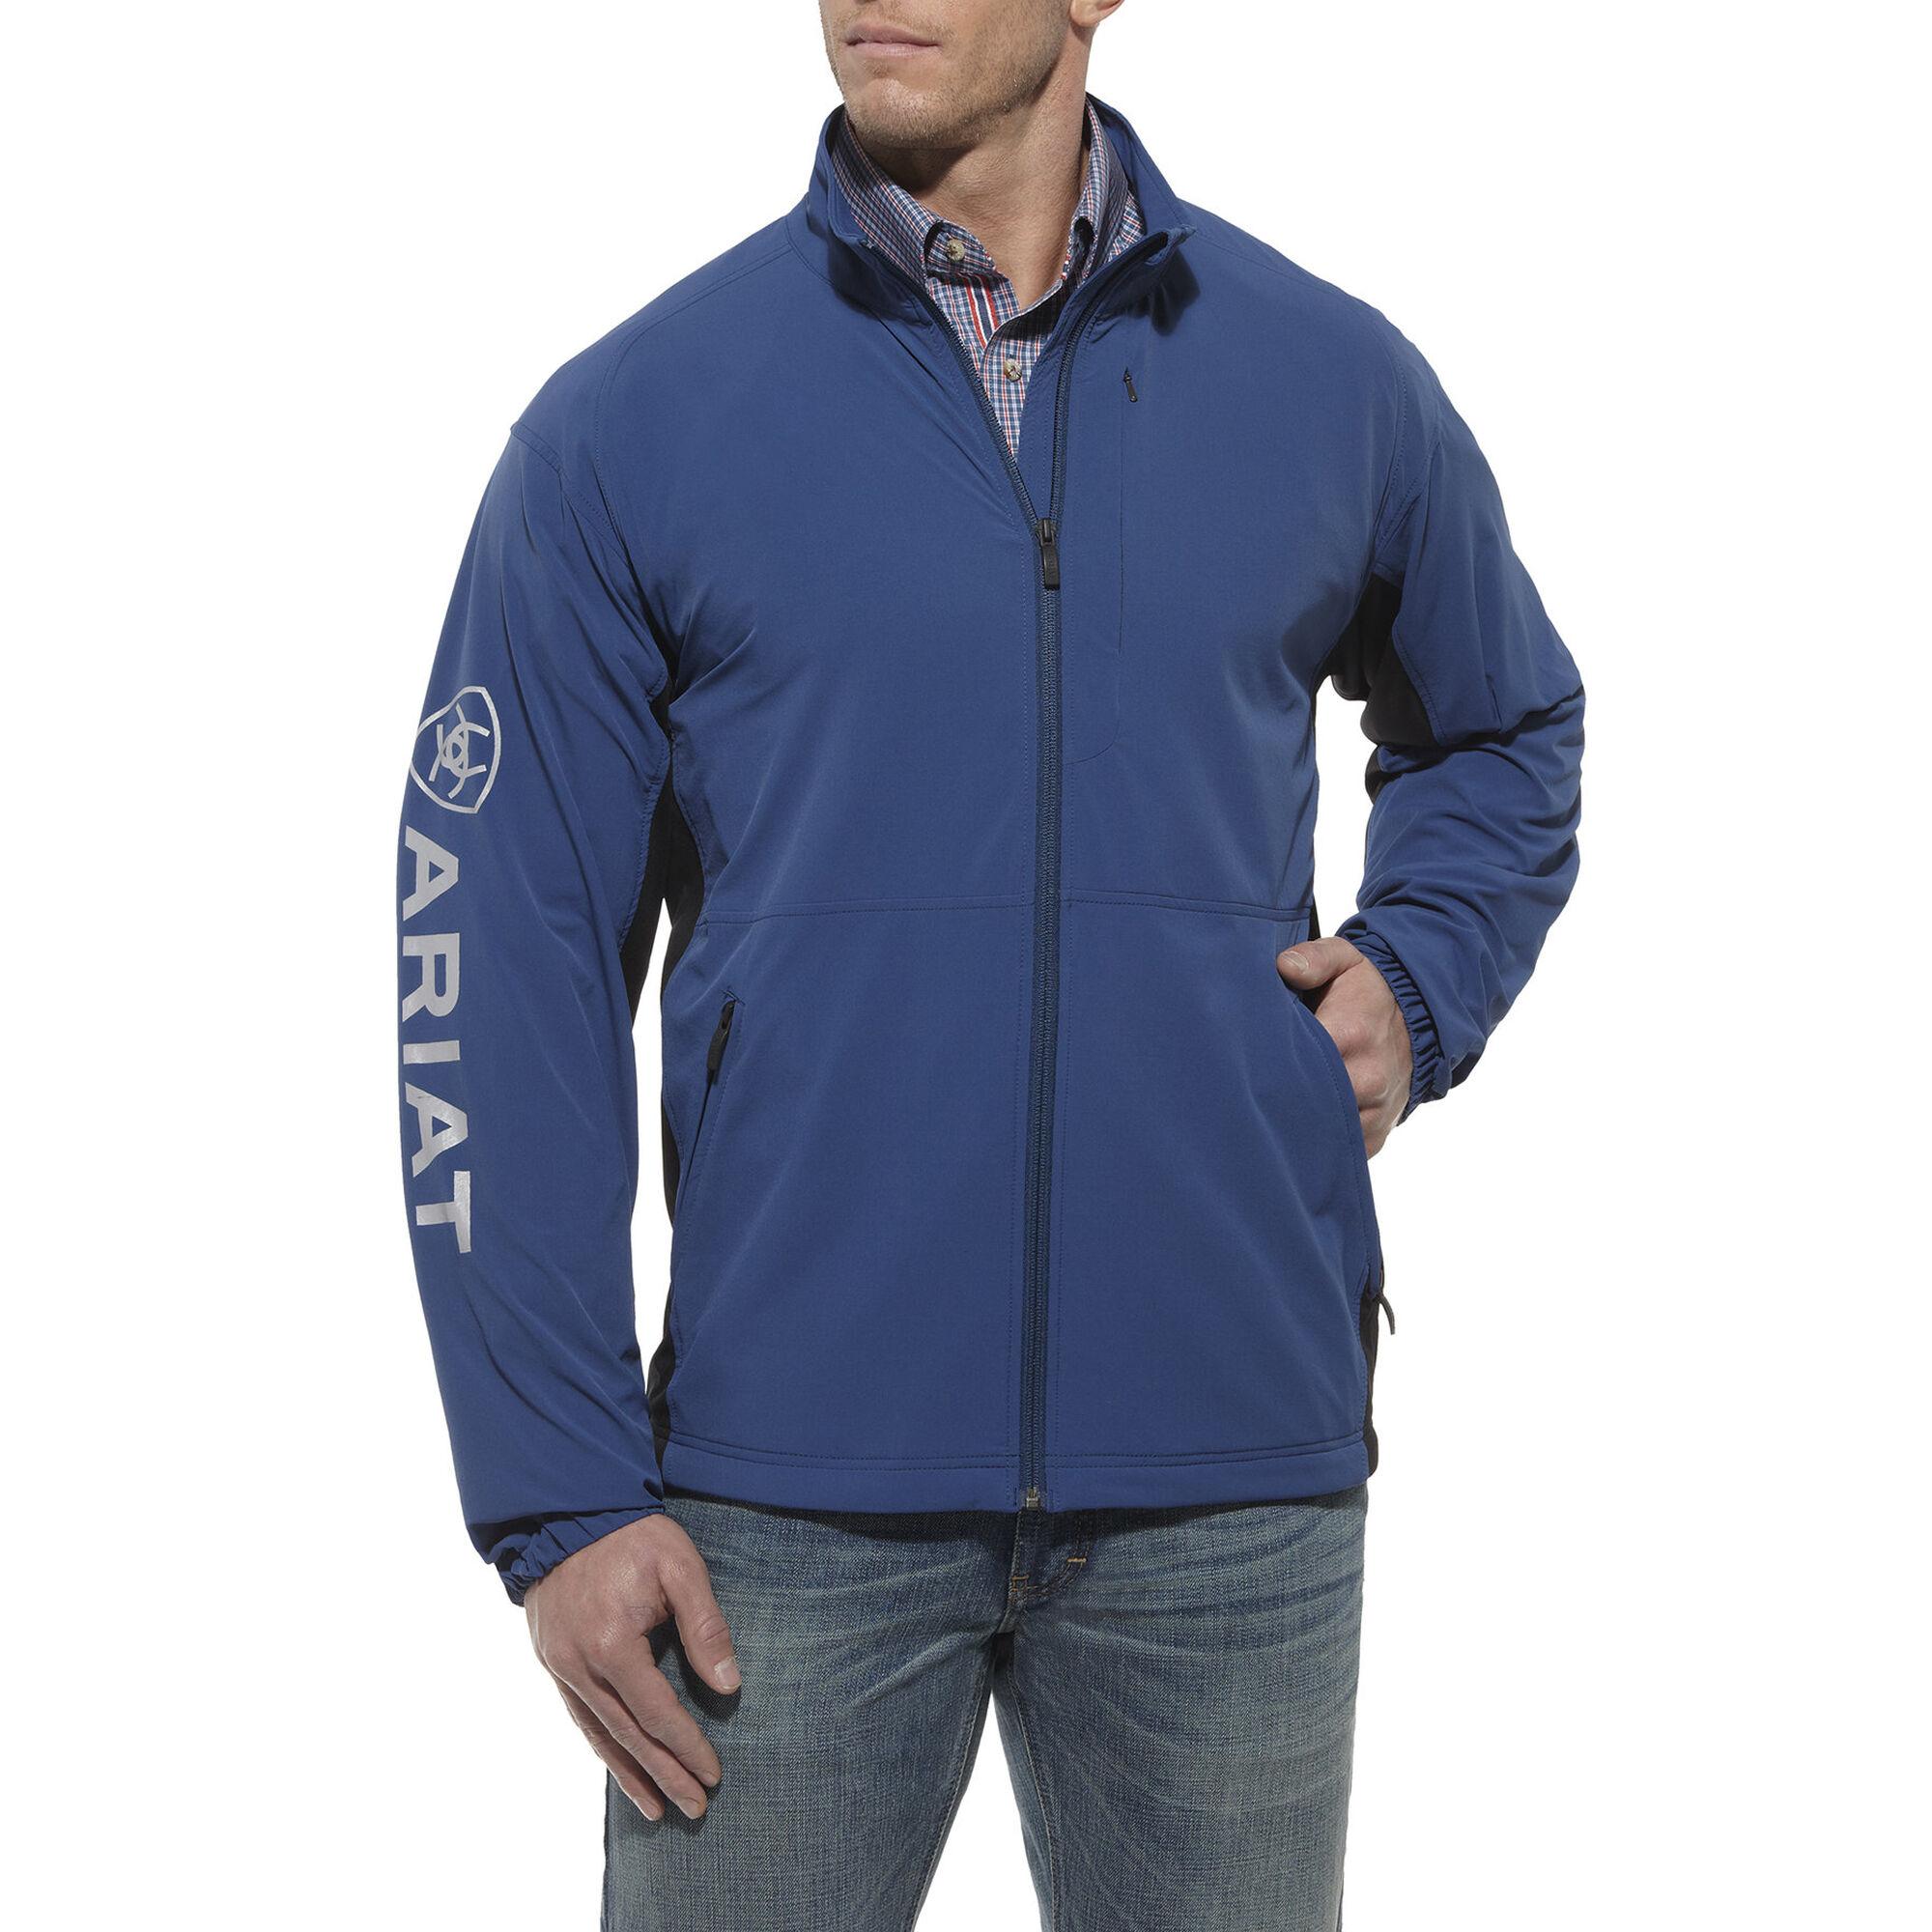 Marin Wind Jacket